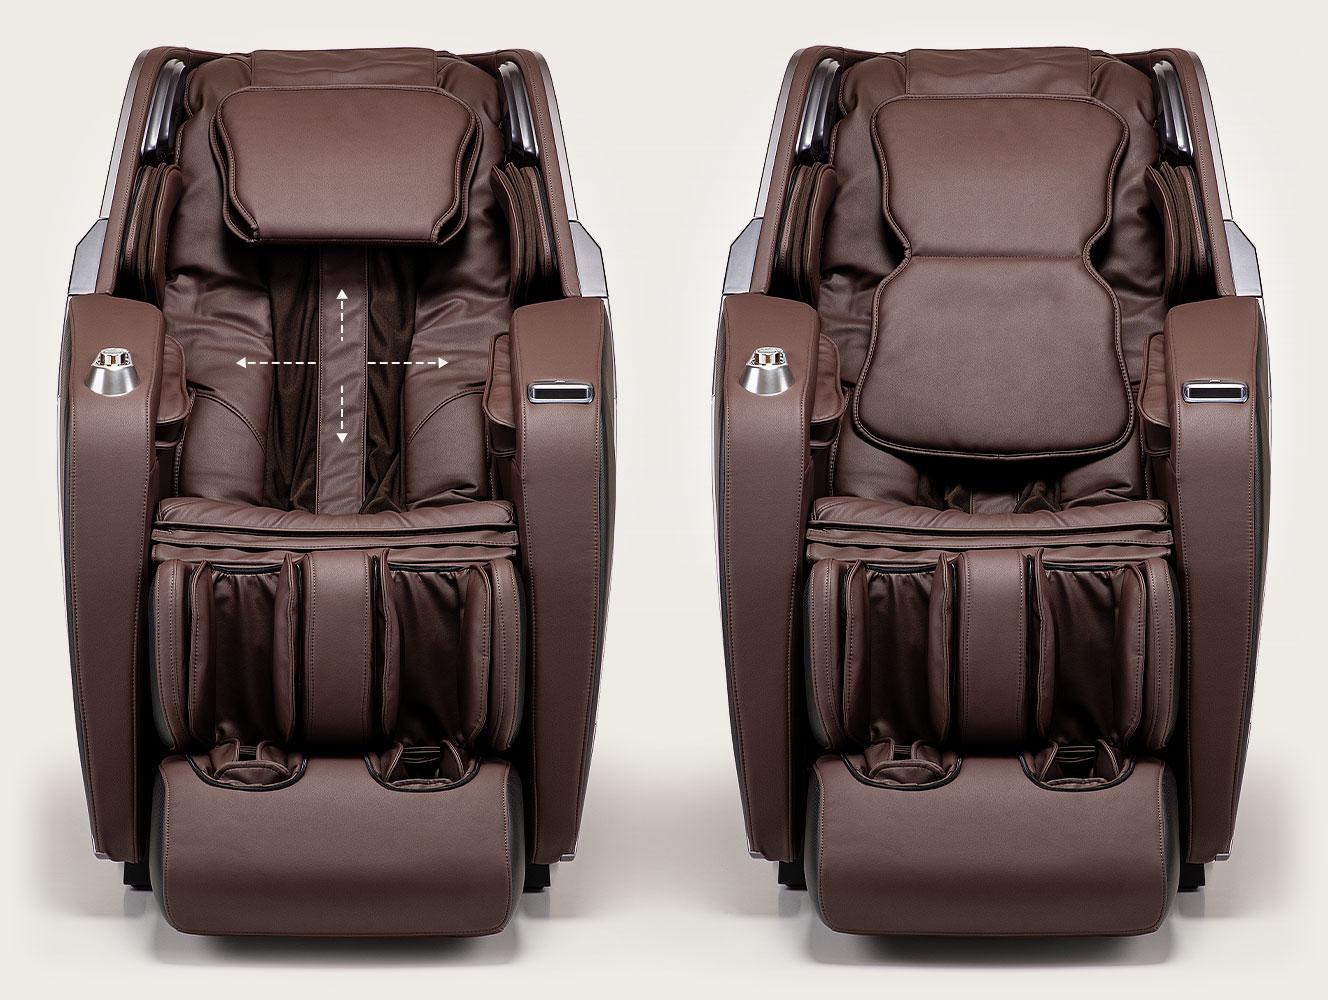 Fotel masujący Massaggio Esclusivo 2 - 2D i siła masażu